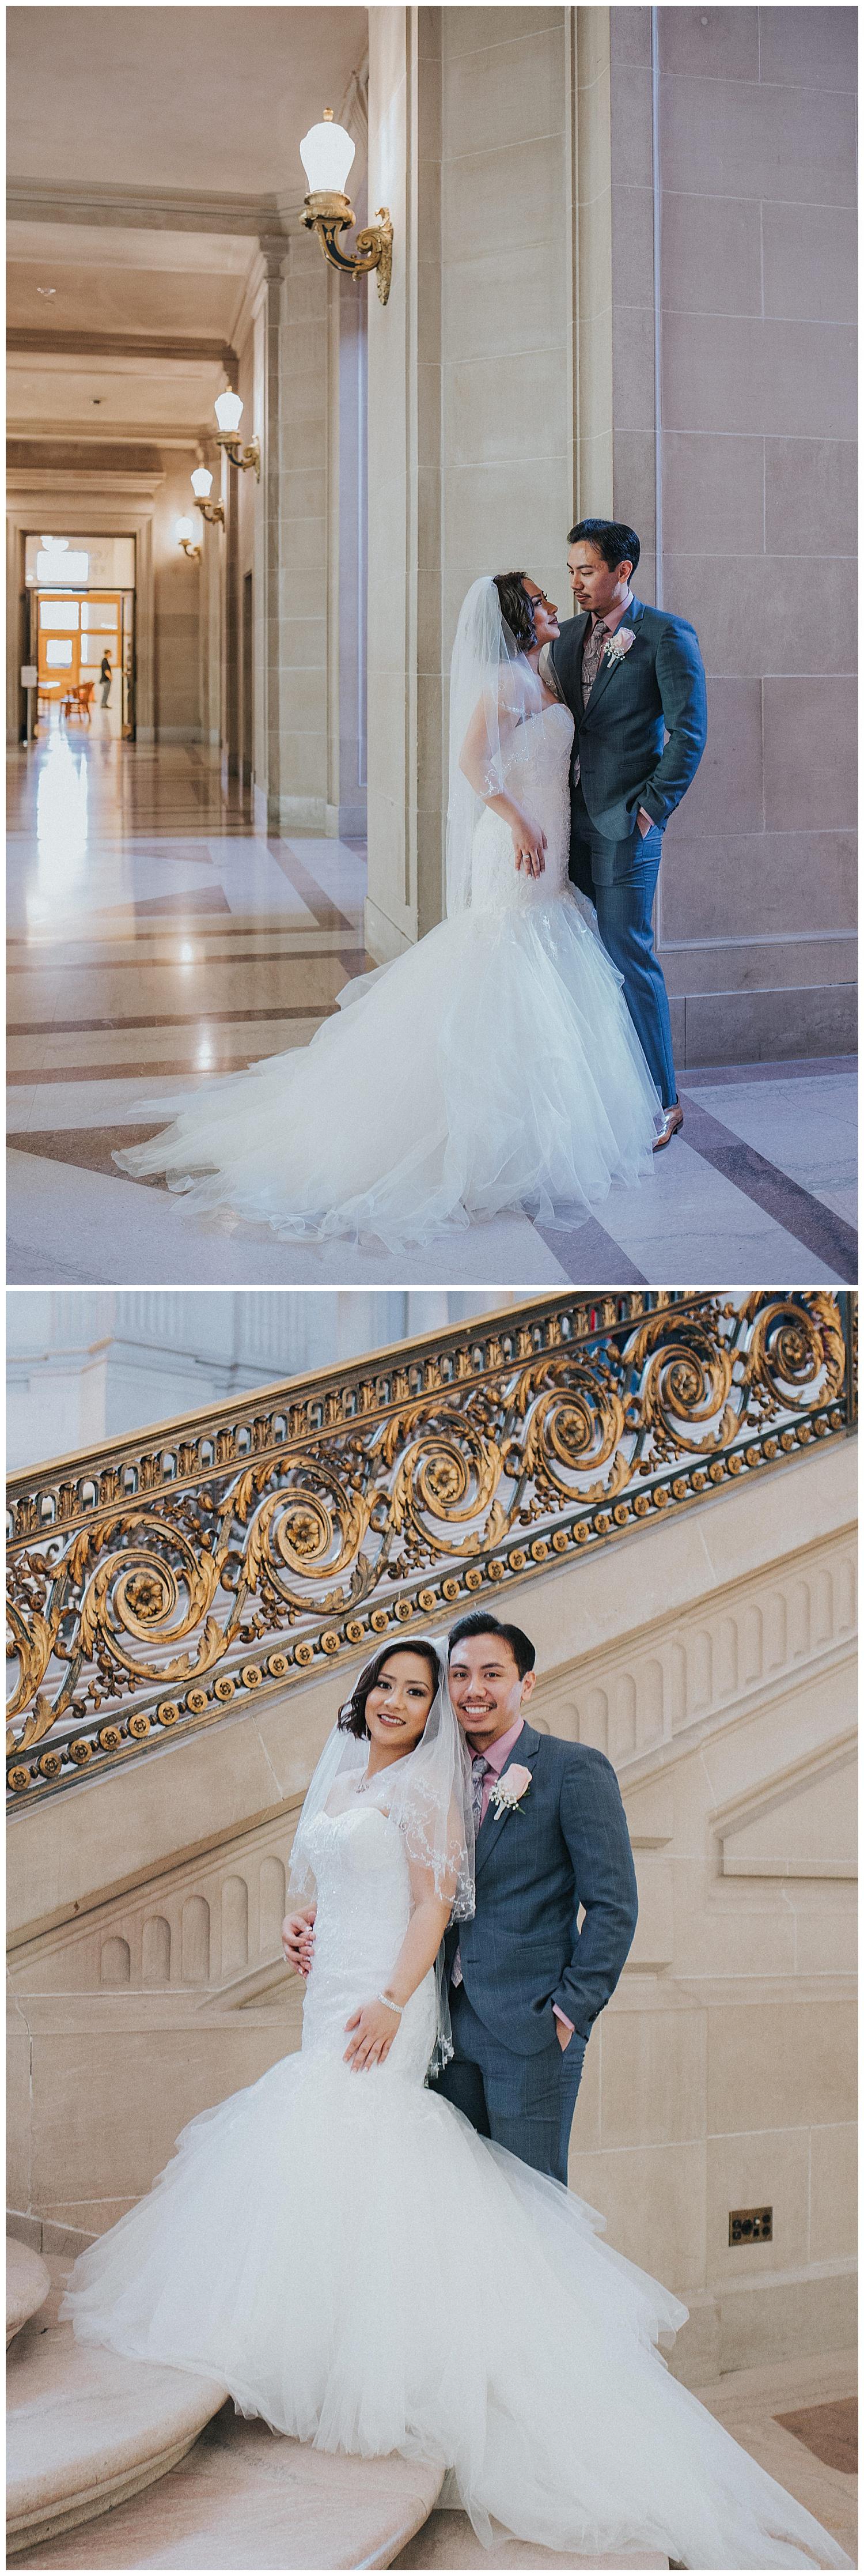 khariza-rae-photography-bay-area-wedding-photographer_0090.jpg